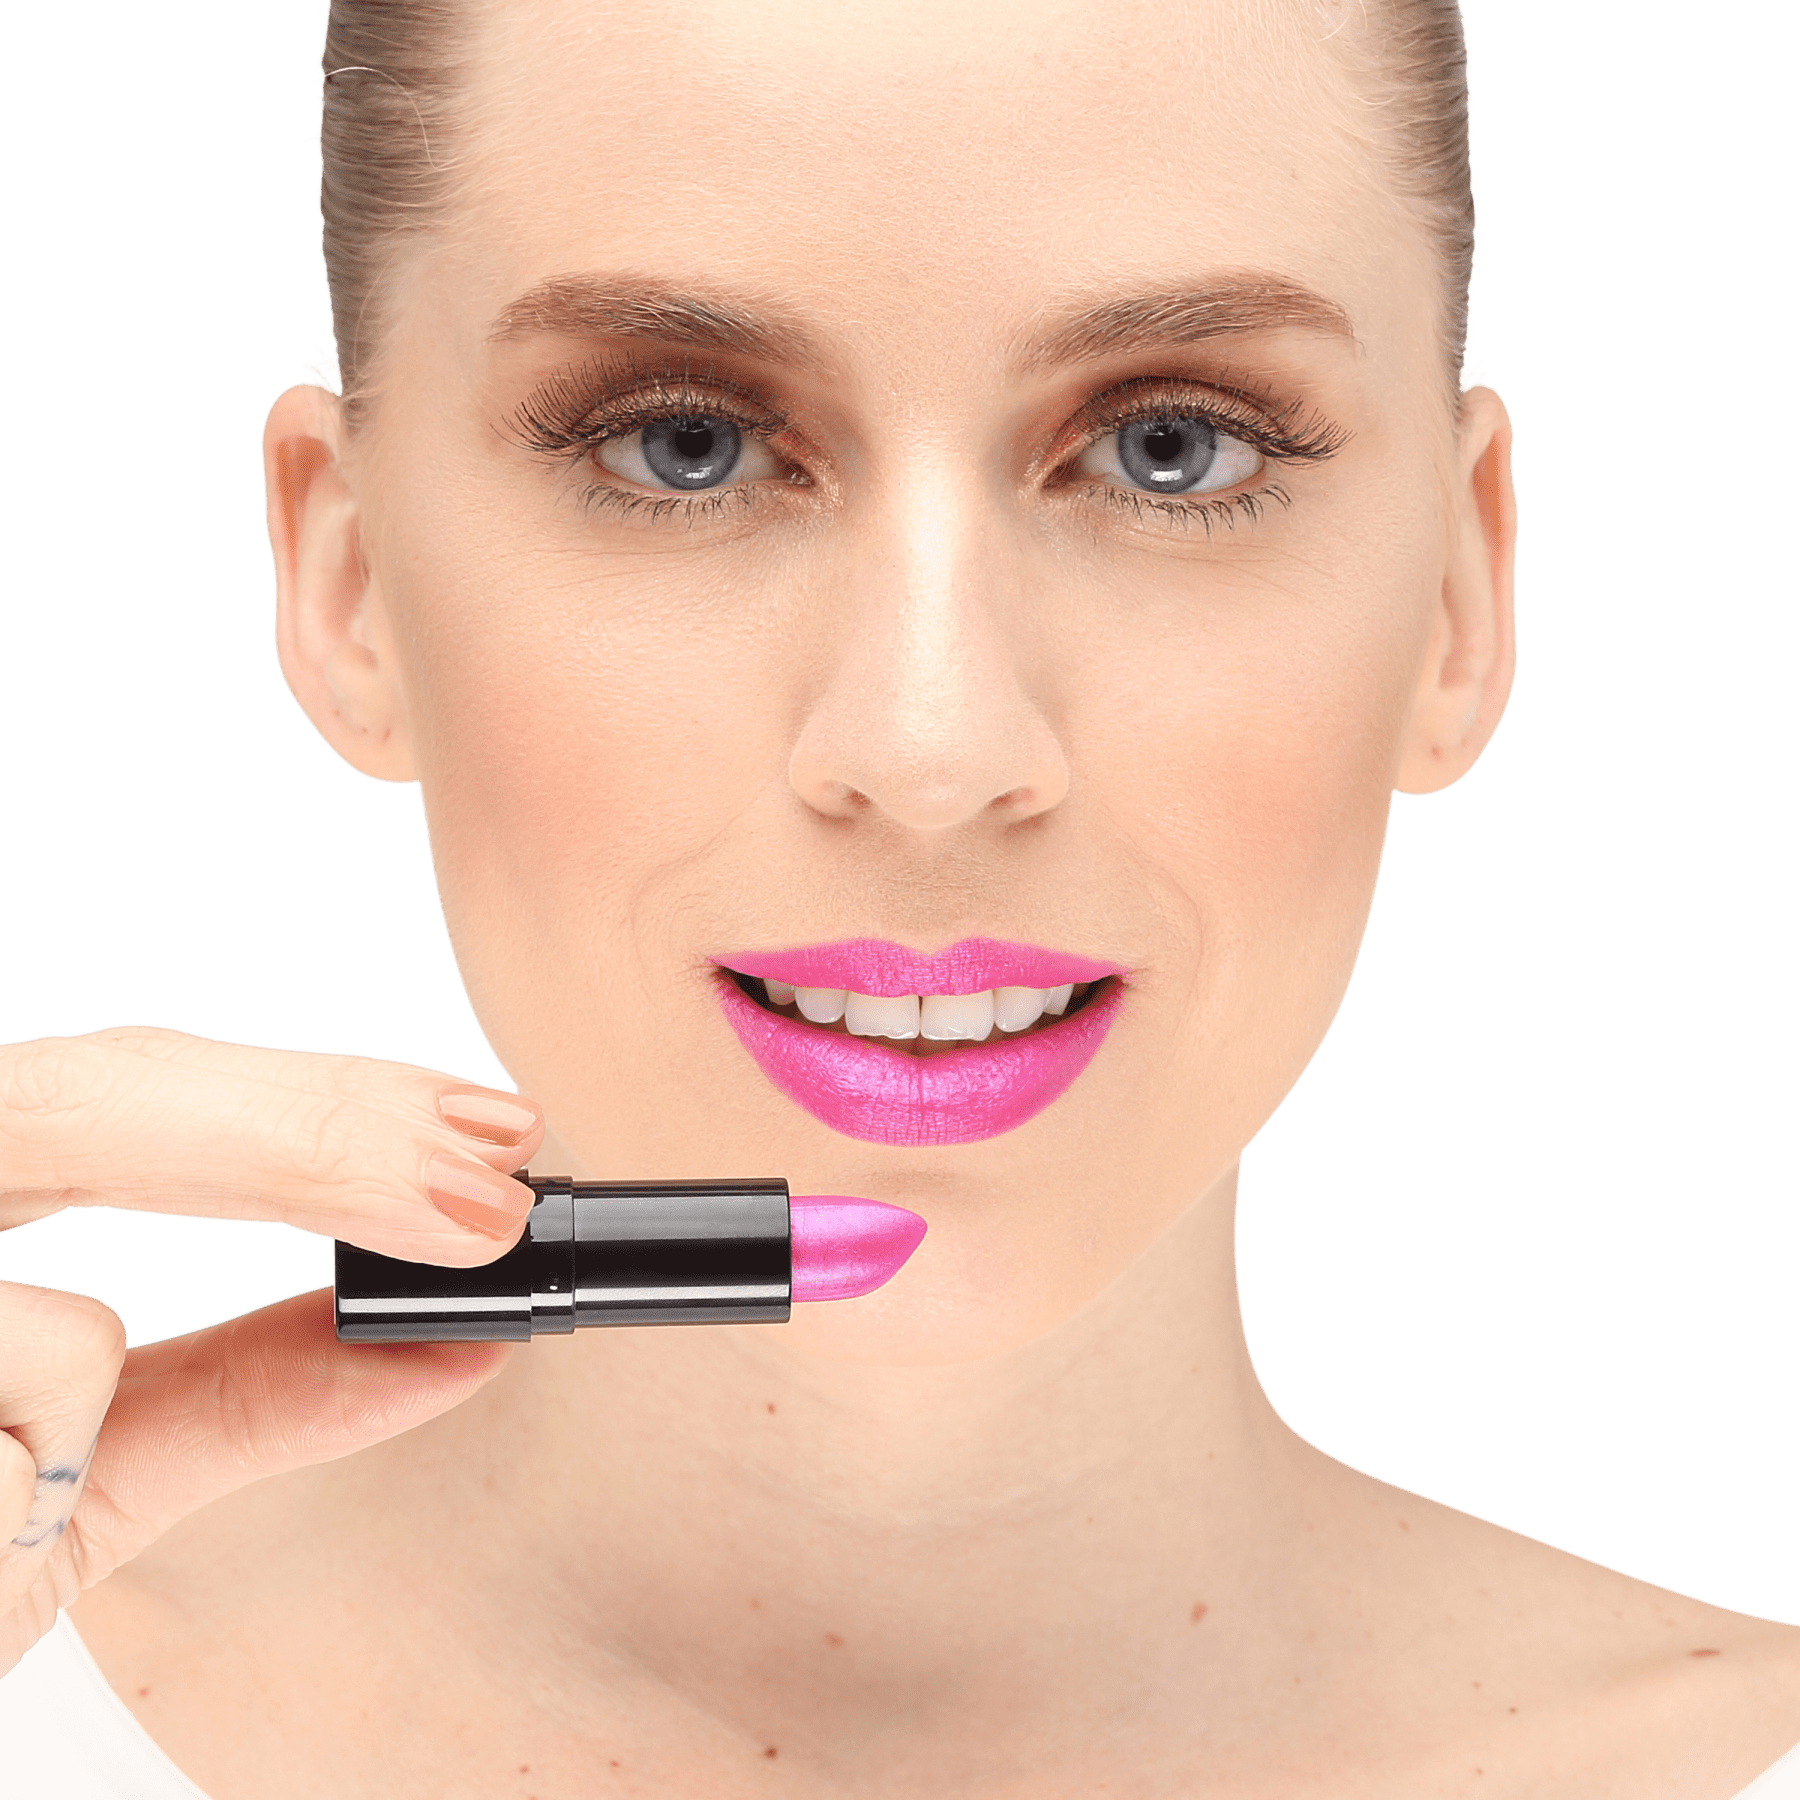 monique The Face: Ruby Kisses Ultra Matte Lipstick Swatches